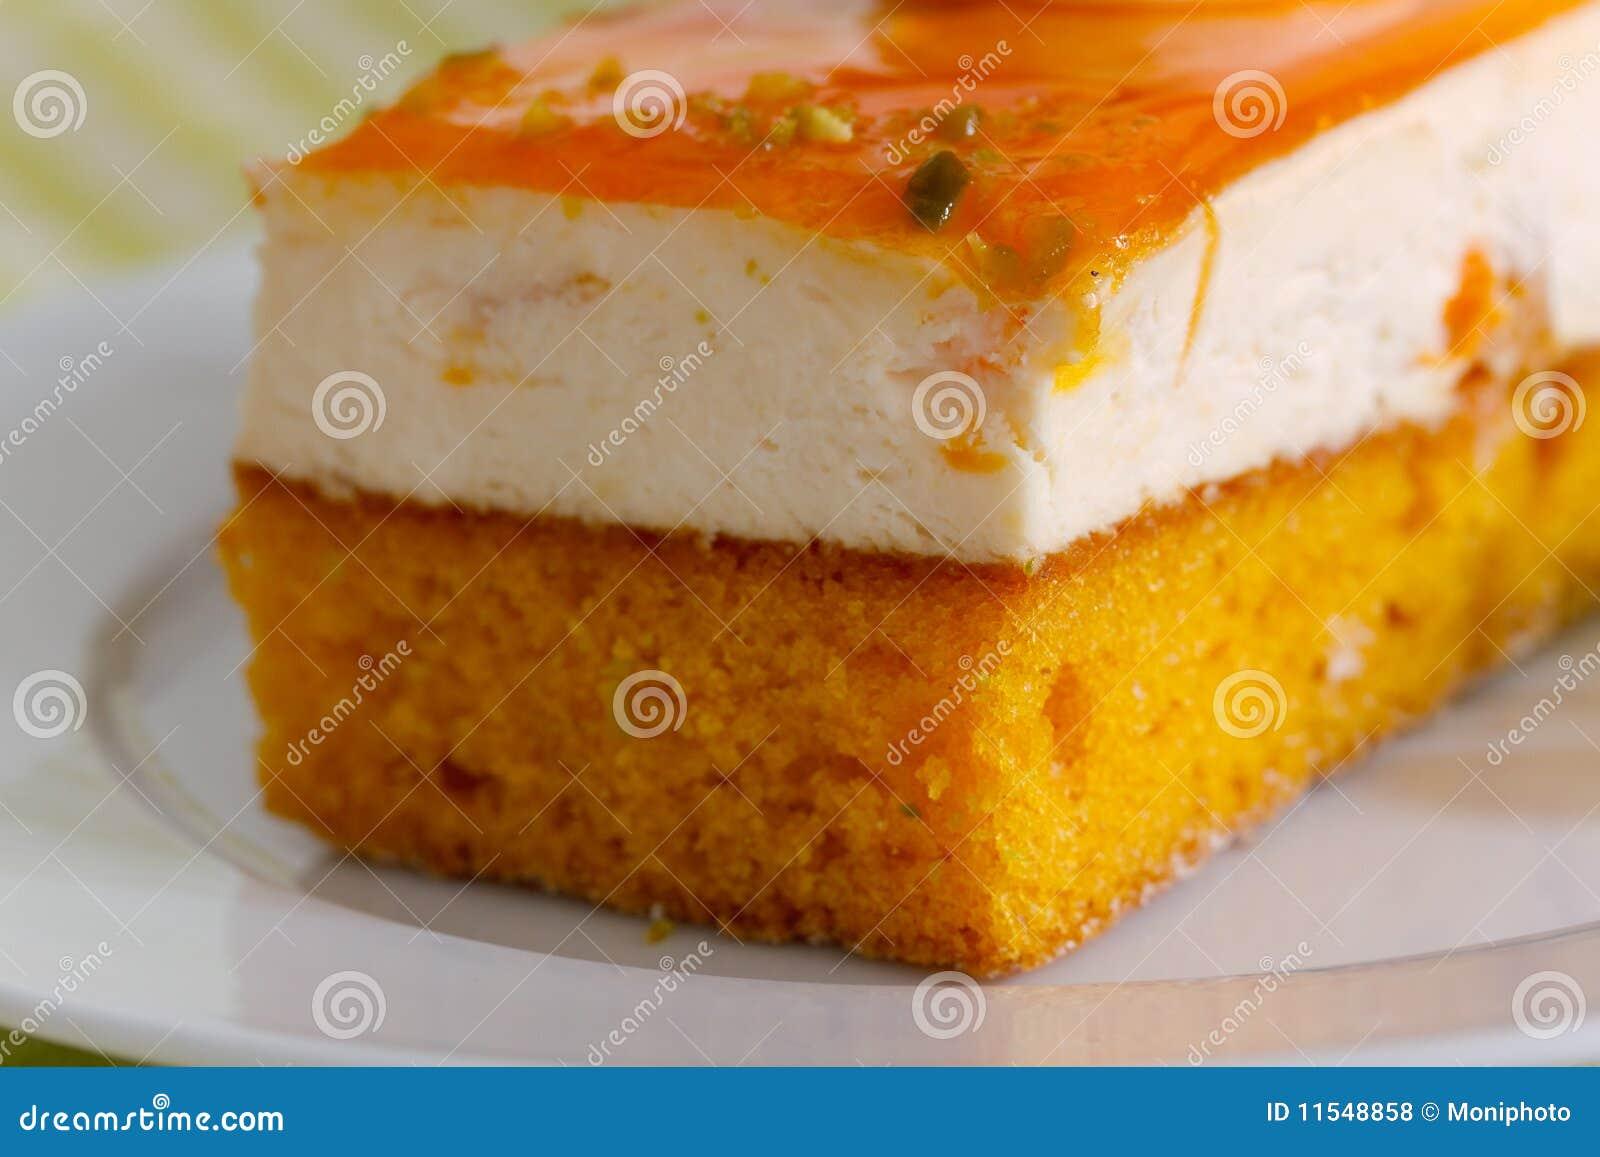 Creamy Orange Cake Recipe — Dishmaps